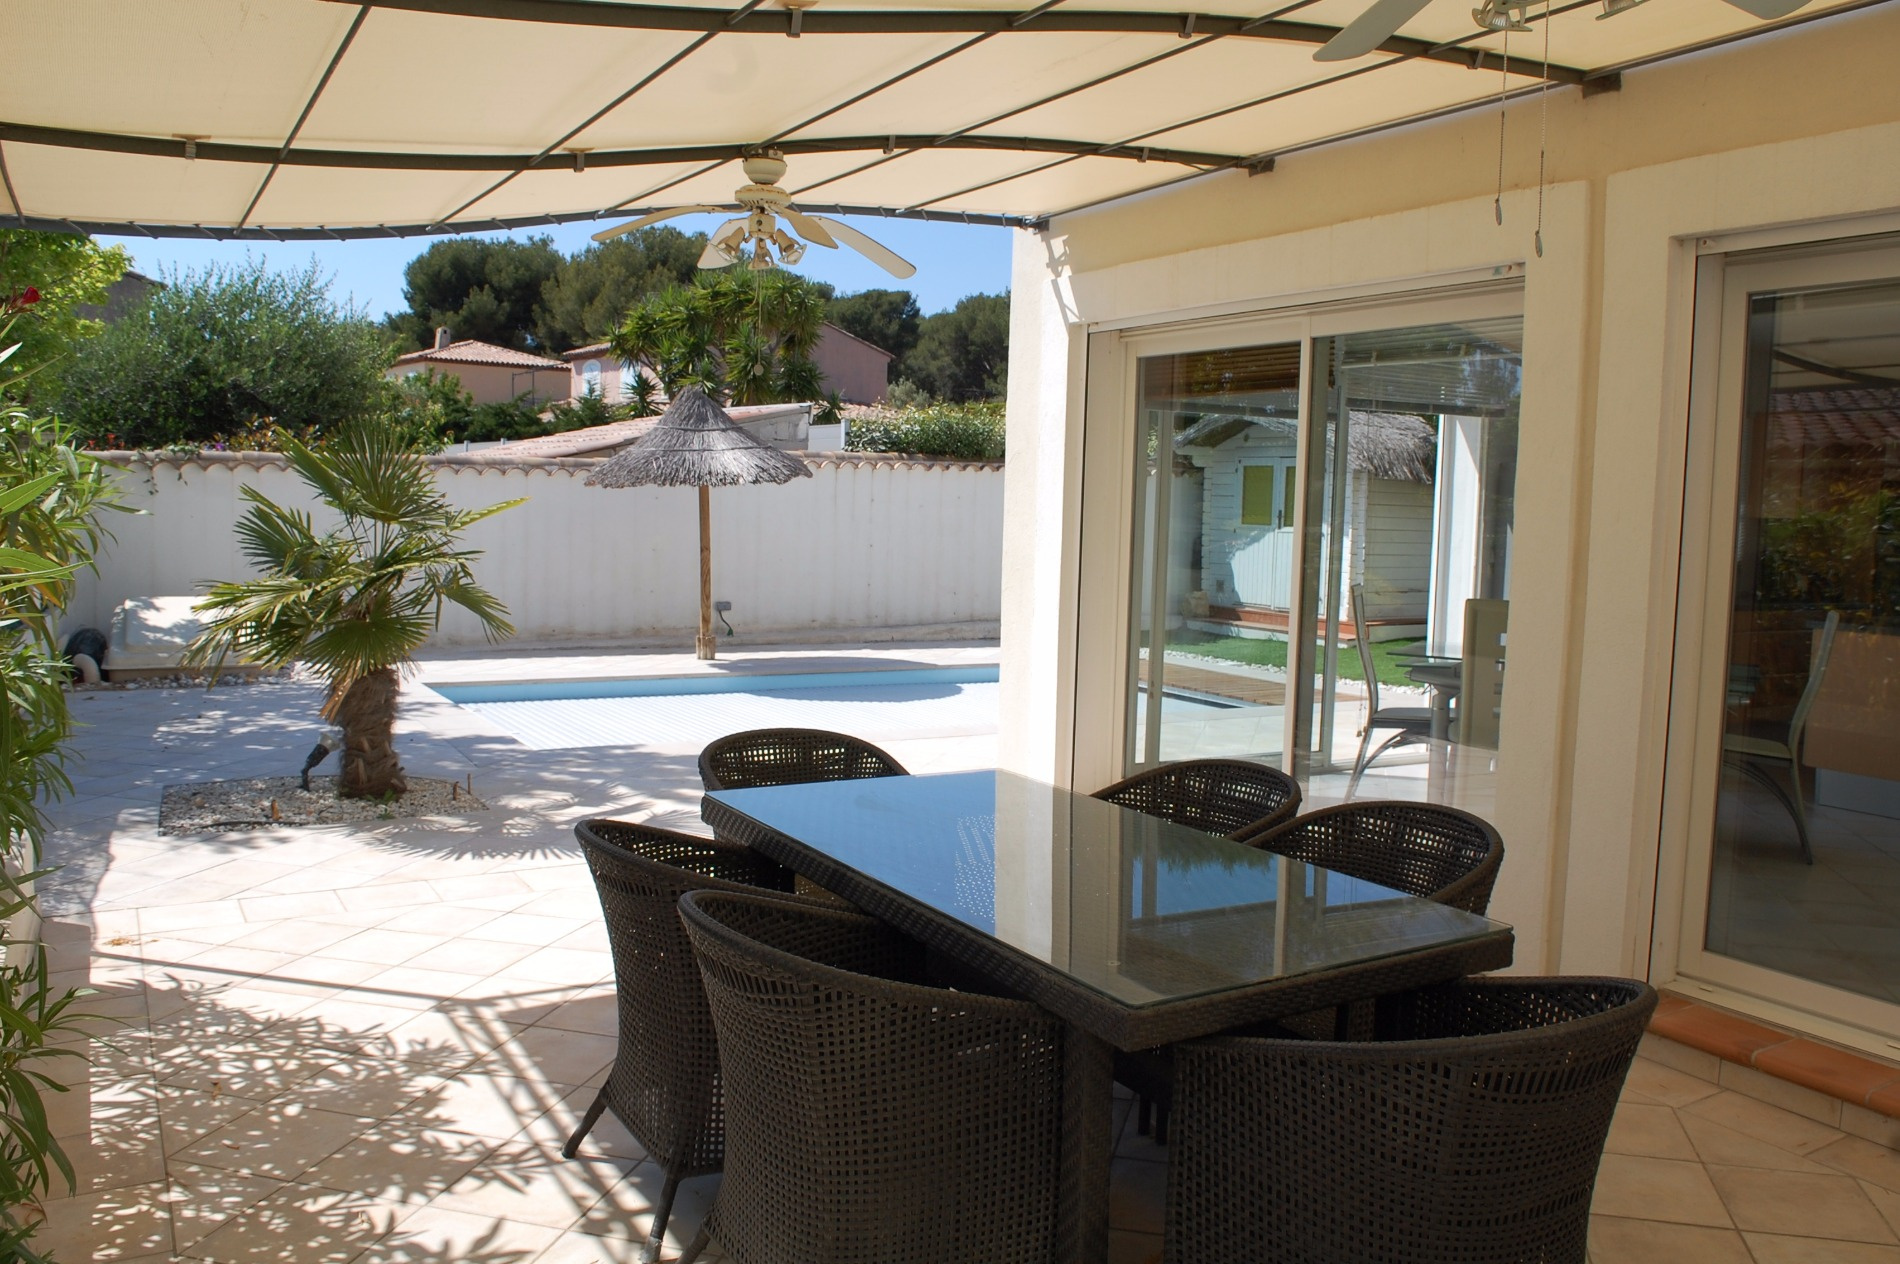 vente sanary sur mer maison vue mer type 5 avec piscine. Black Bedroom Furniture Sets. Home Design Ideas